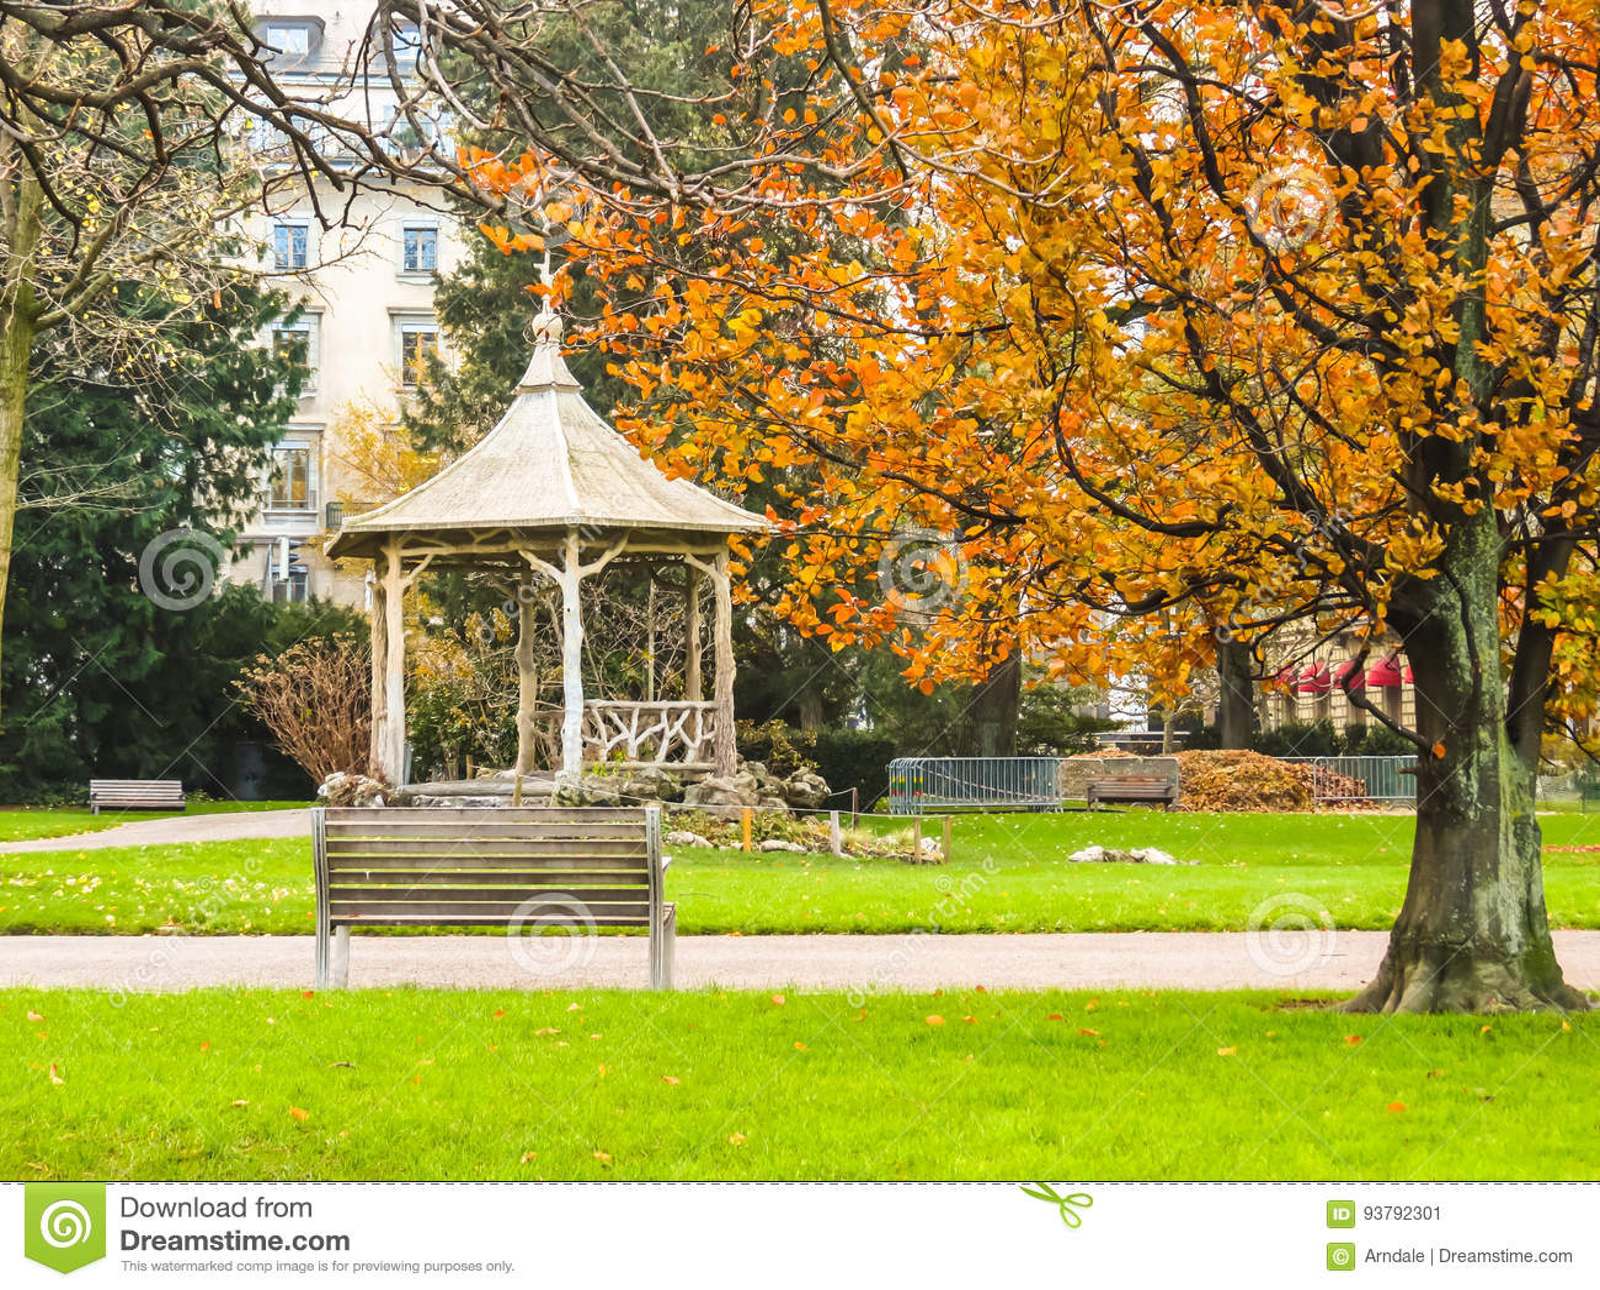 Jardin Anglais Geneva City Switzerland Stock Image Image Of Park